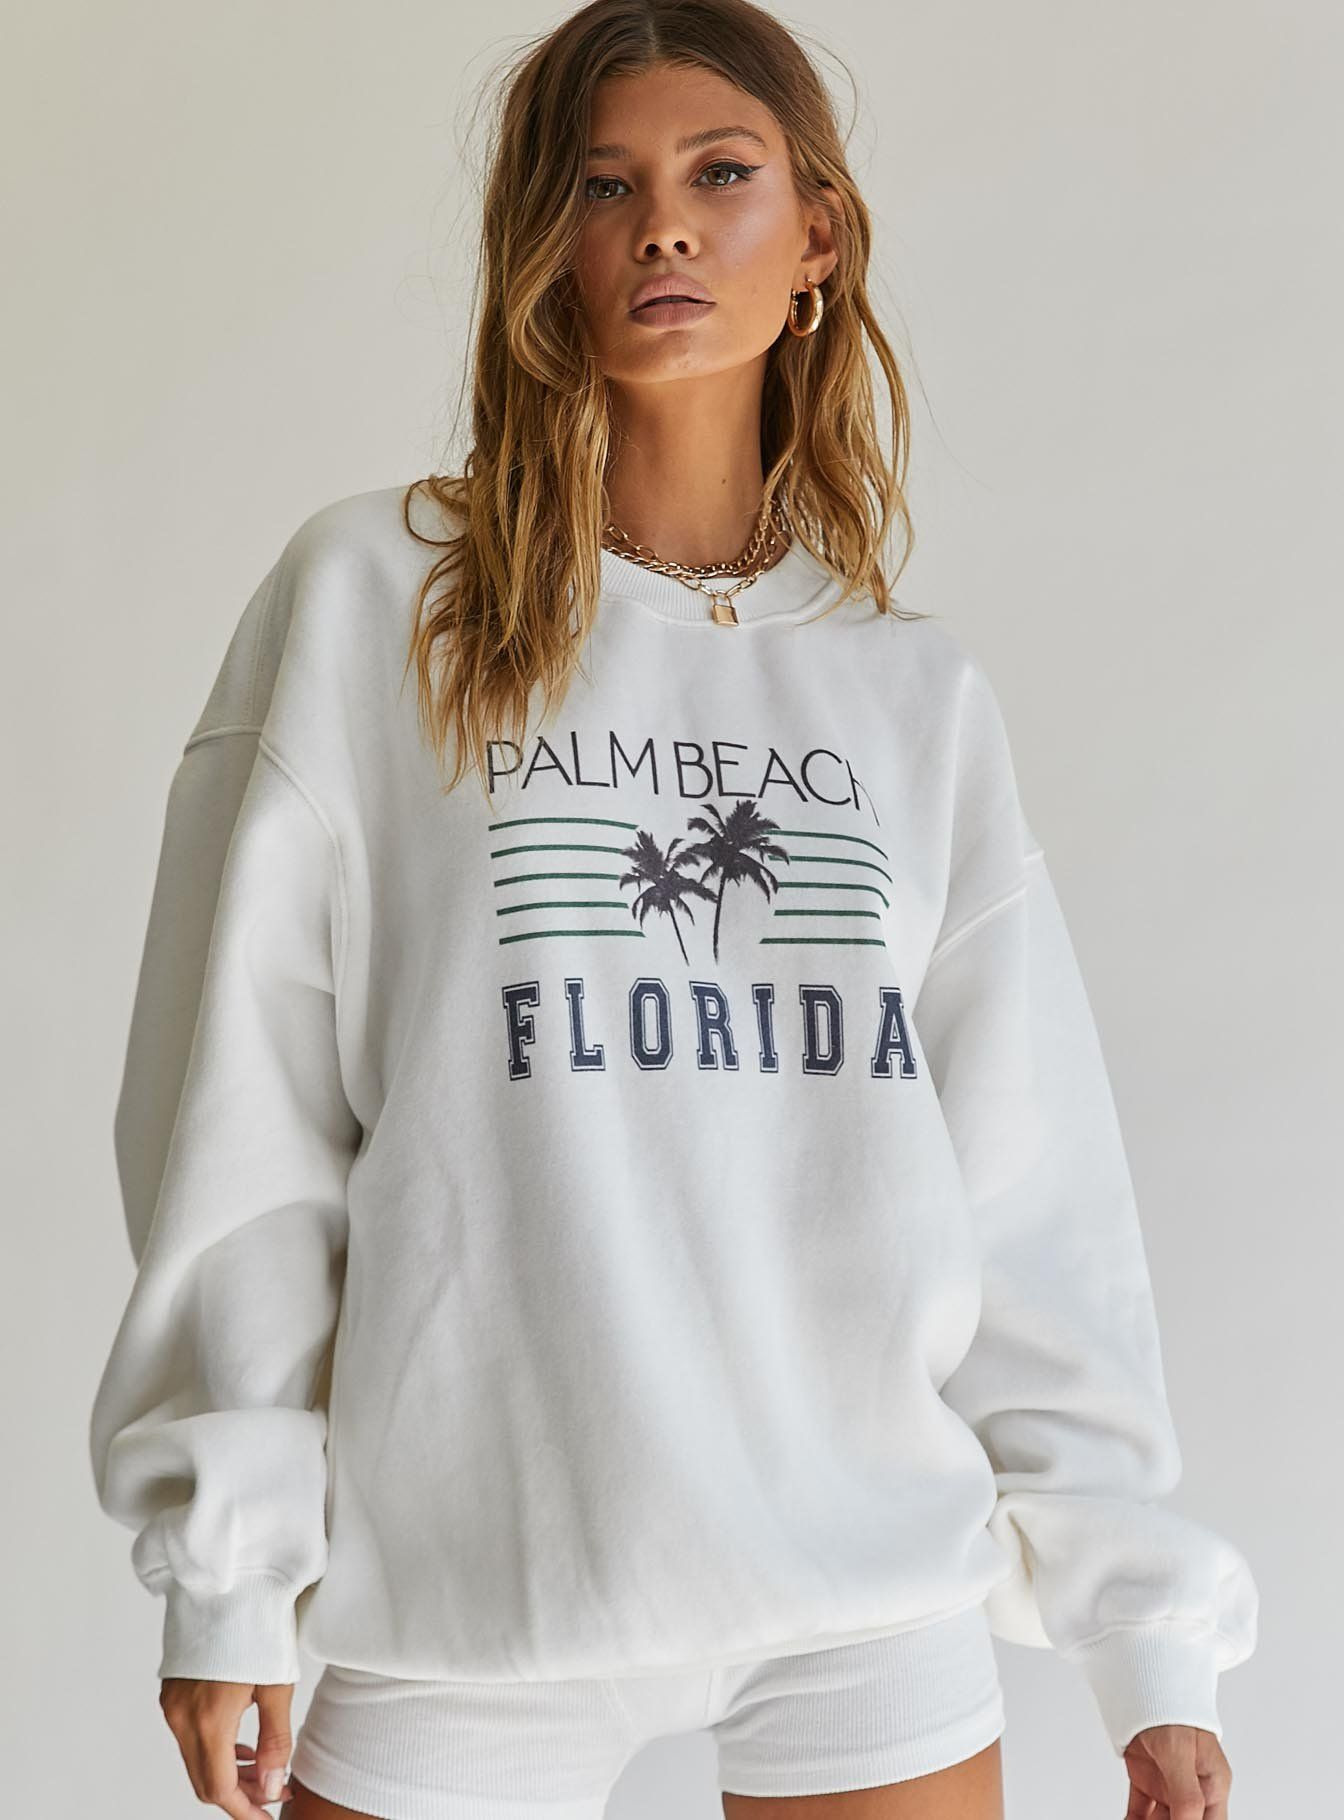 Palm Beach Oversized Crewneck Sweatshirt White In 2021 Oversized Crewneck Crewneck Sweatshirt Outfit Vintage Crewneck [ 1820 x 1344 Pixel ]